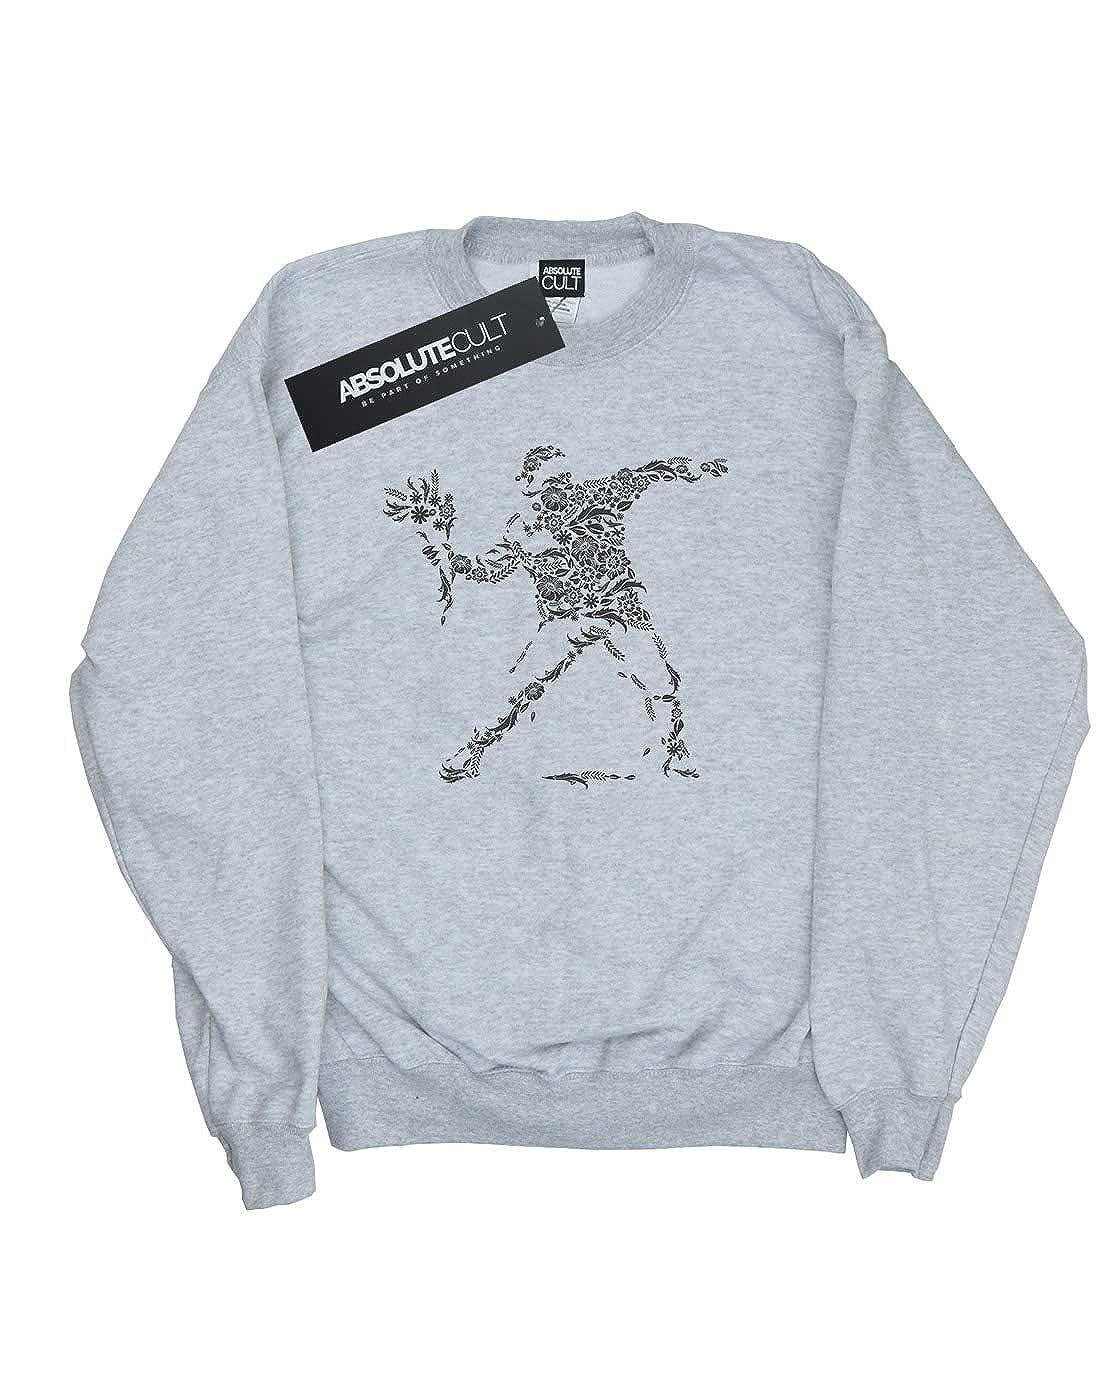 Absolute Cult Drewbacca Girls Flourish Vandalism Sweatshirt